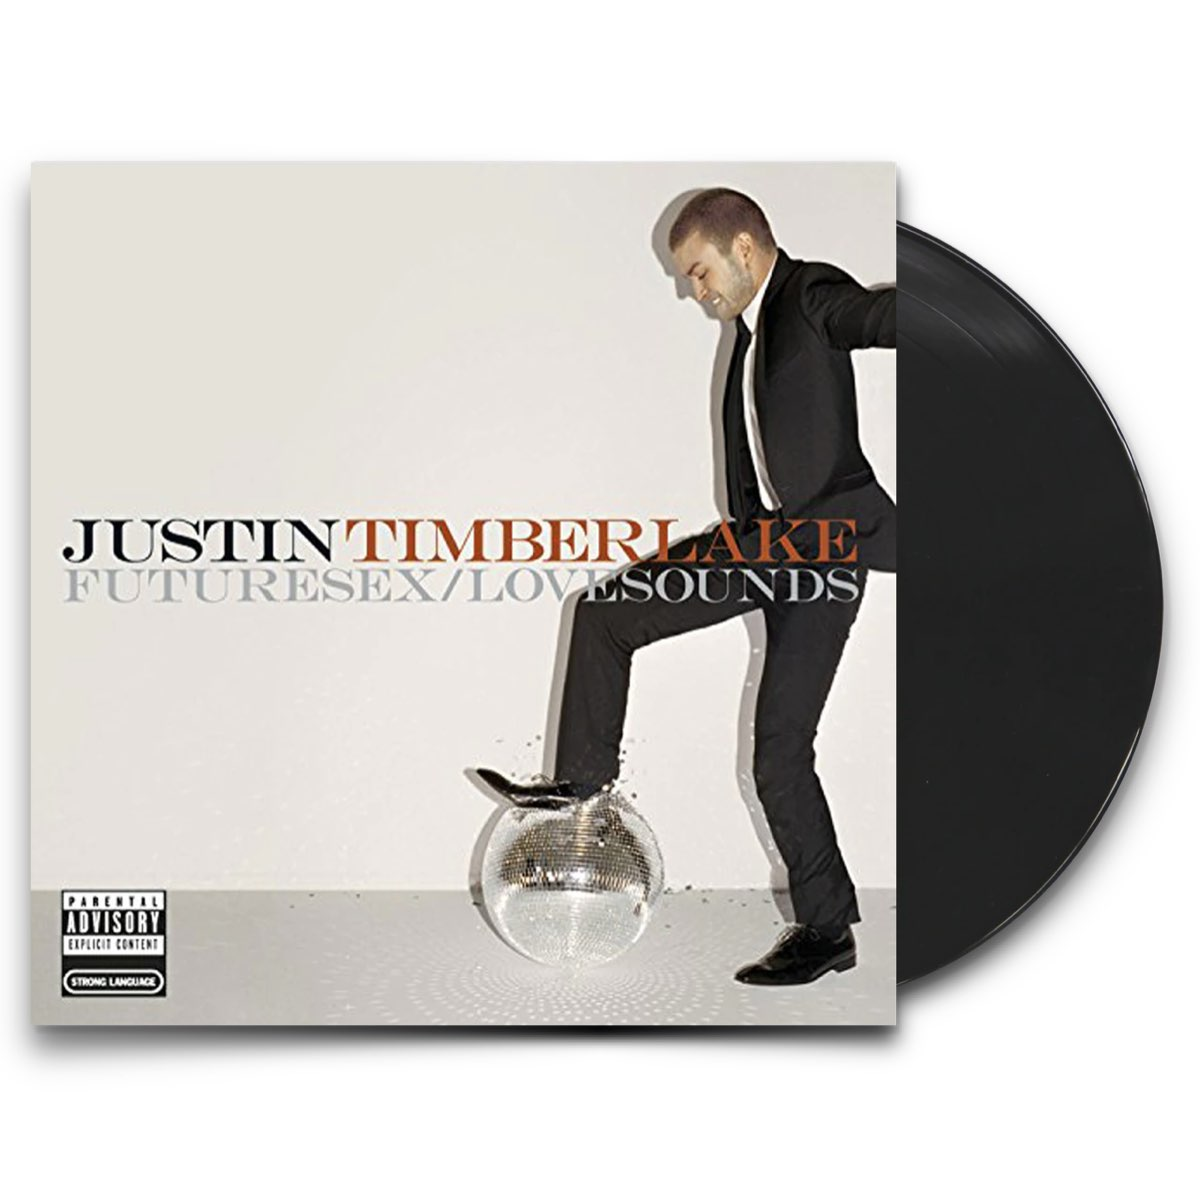 Justin Timberlake - FutureSex / LoveSounds [Double Black Vinyl]